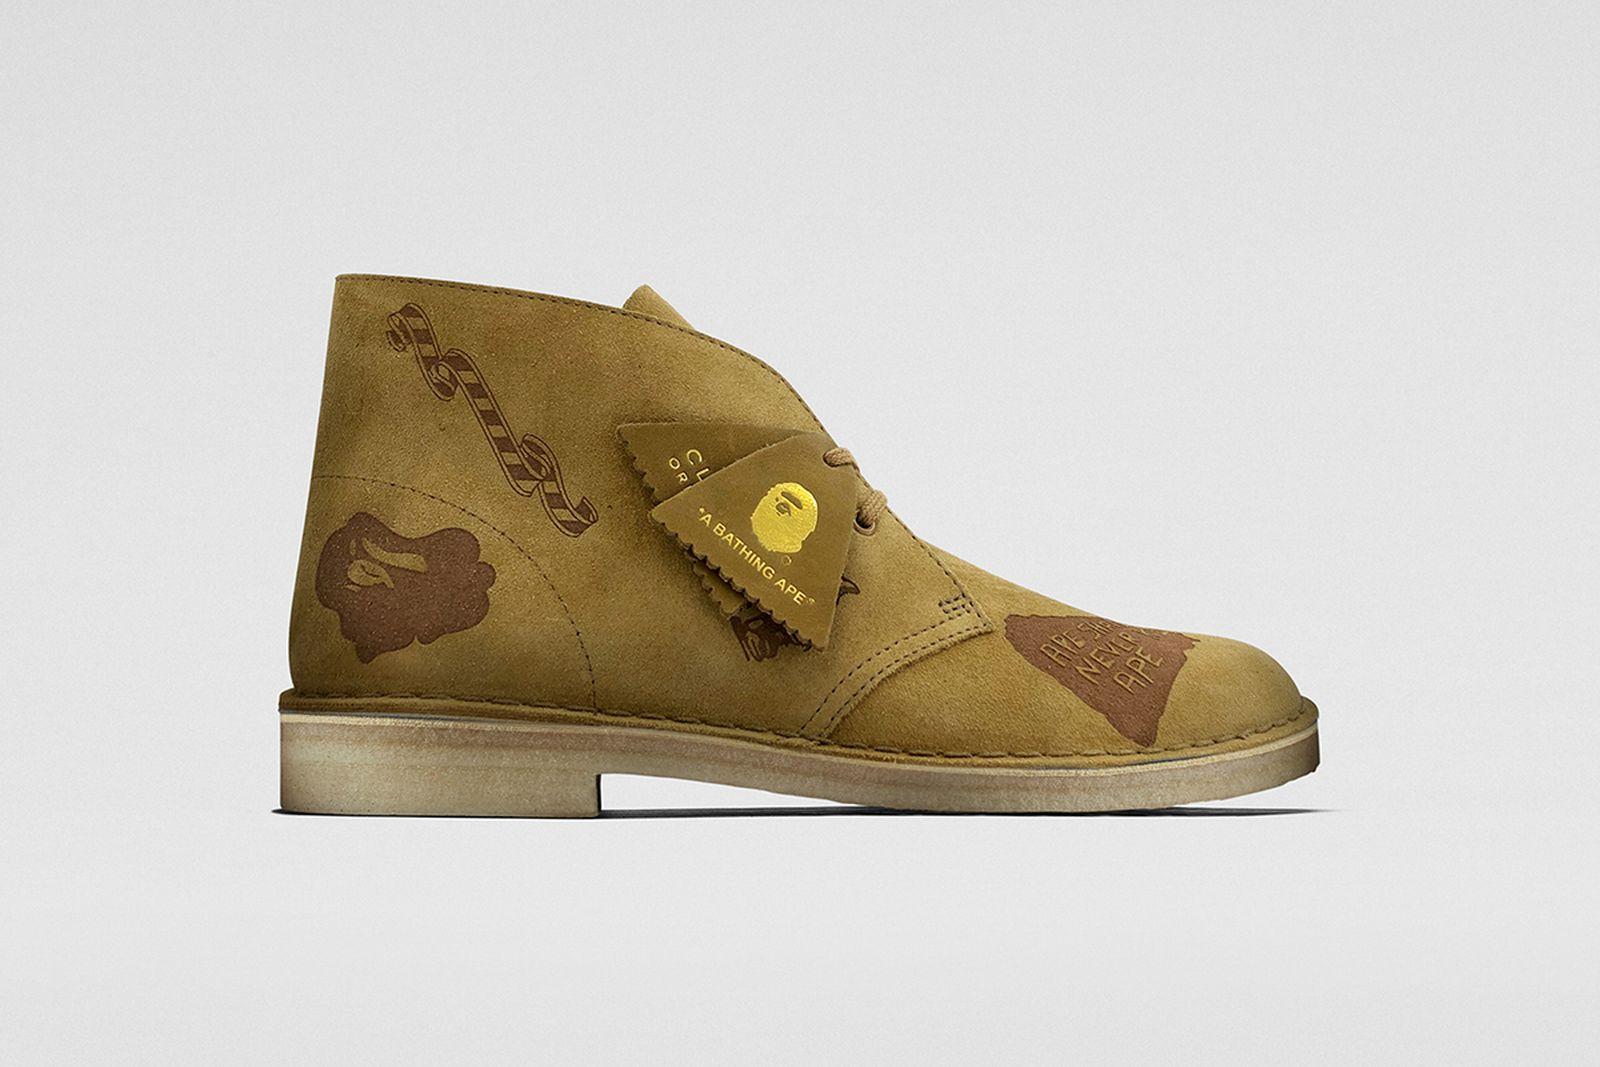 bape-clarks-wallabee-desert-boot-release-date-price-12